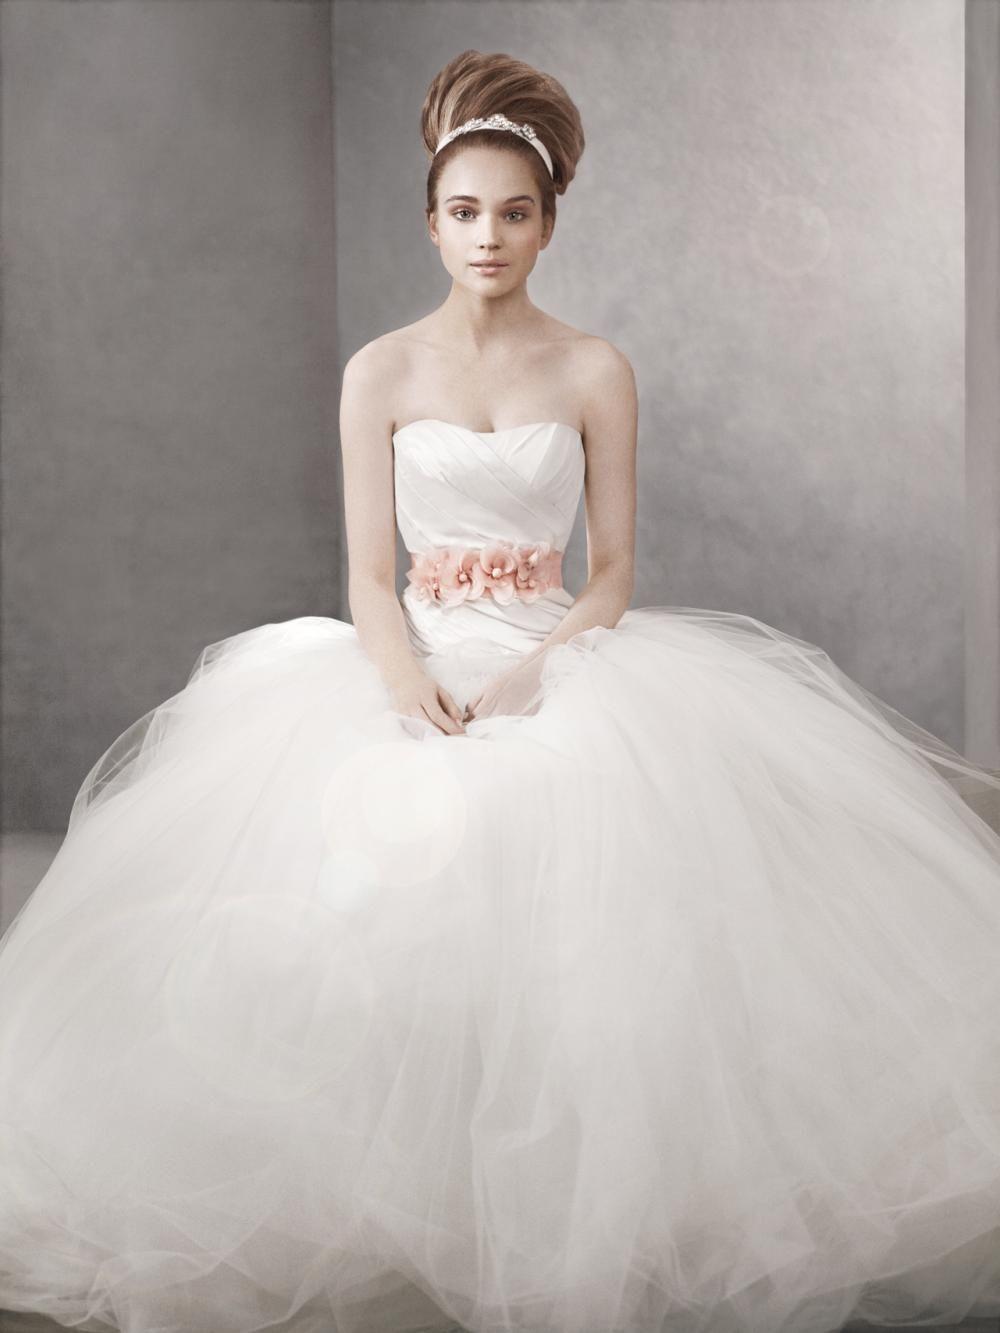 Designer Wedding Dress Gallery White By Vera Wang Wedding Dresses Vera Wang Traditional Wedding Dresses White Wedding Dresses [ 1333 x 1000 Pixel ]